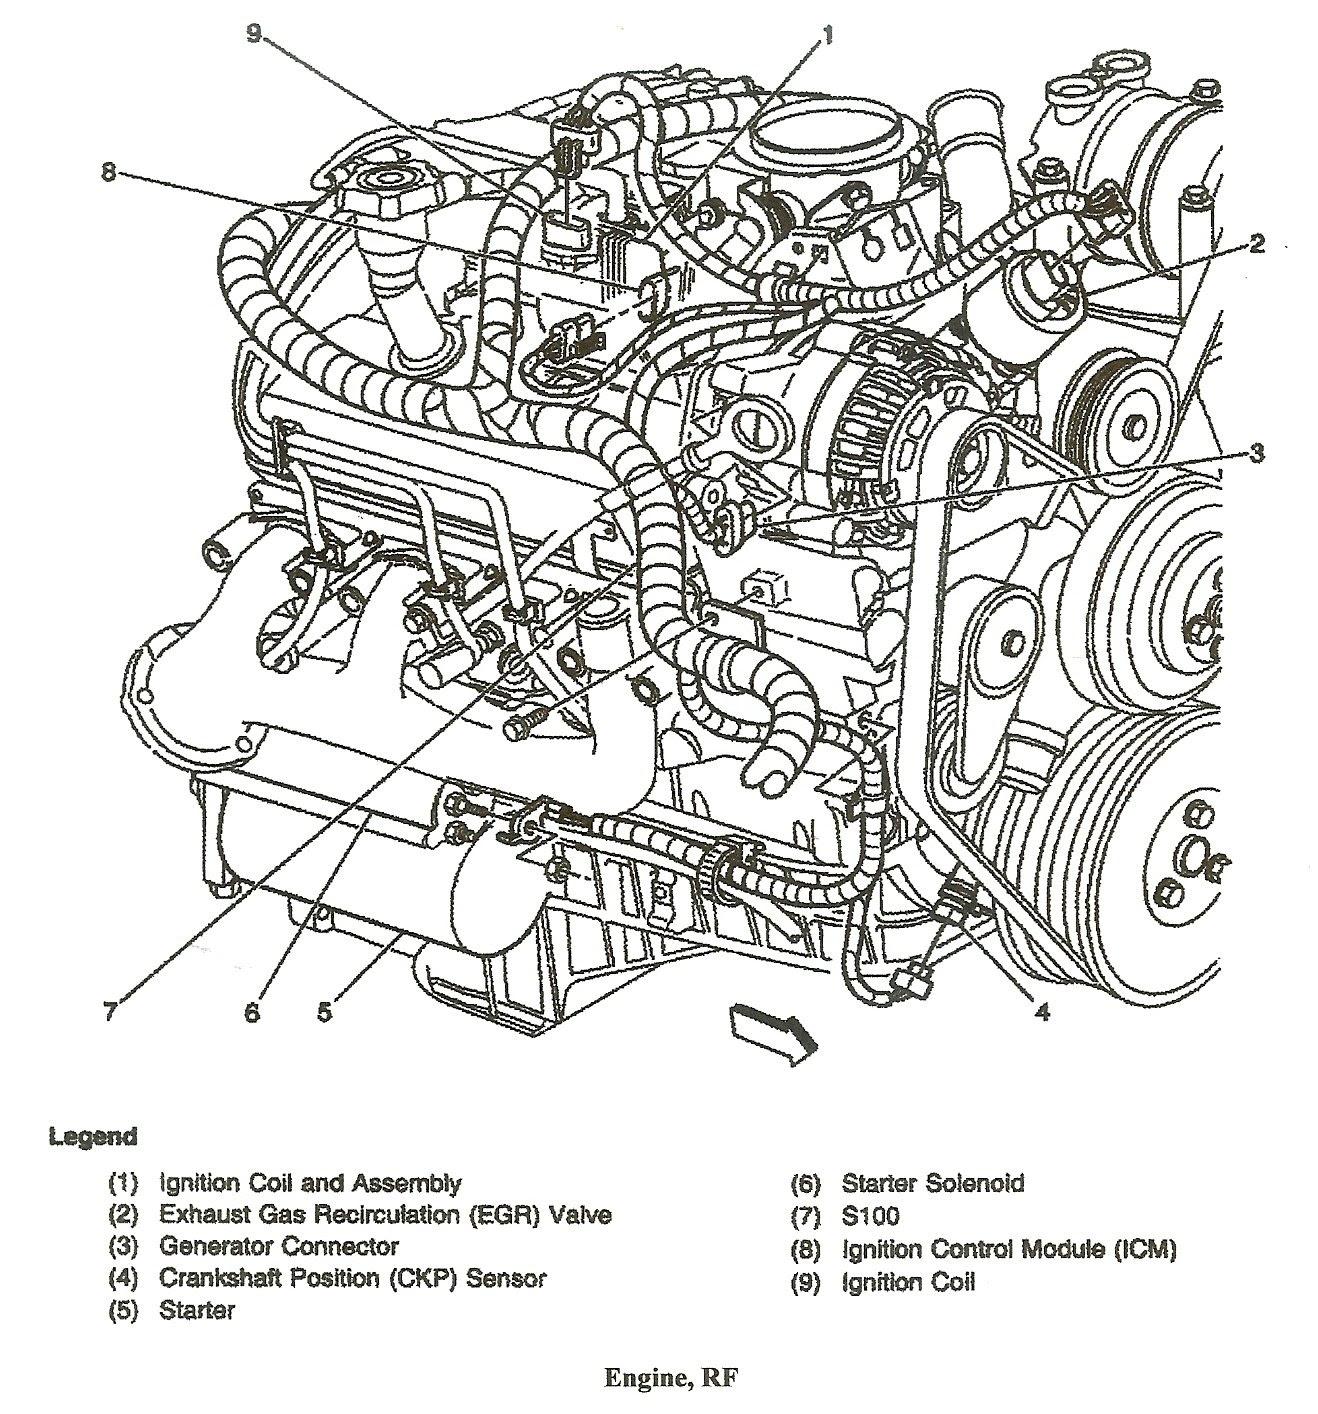 chevy trailblazer engine diagram free download - wiring diagram  wiring diagram